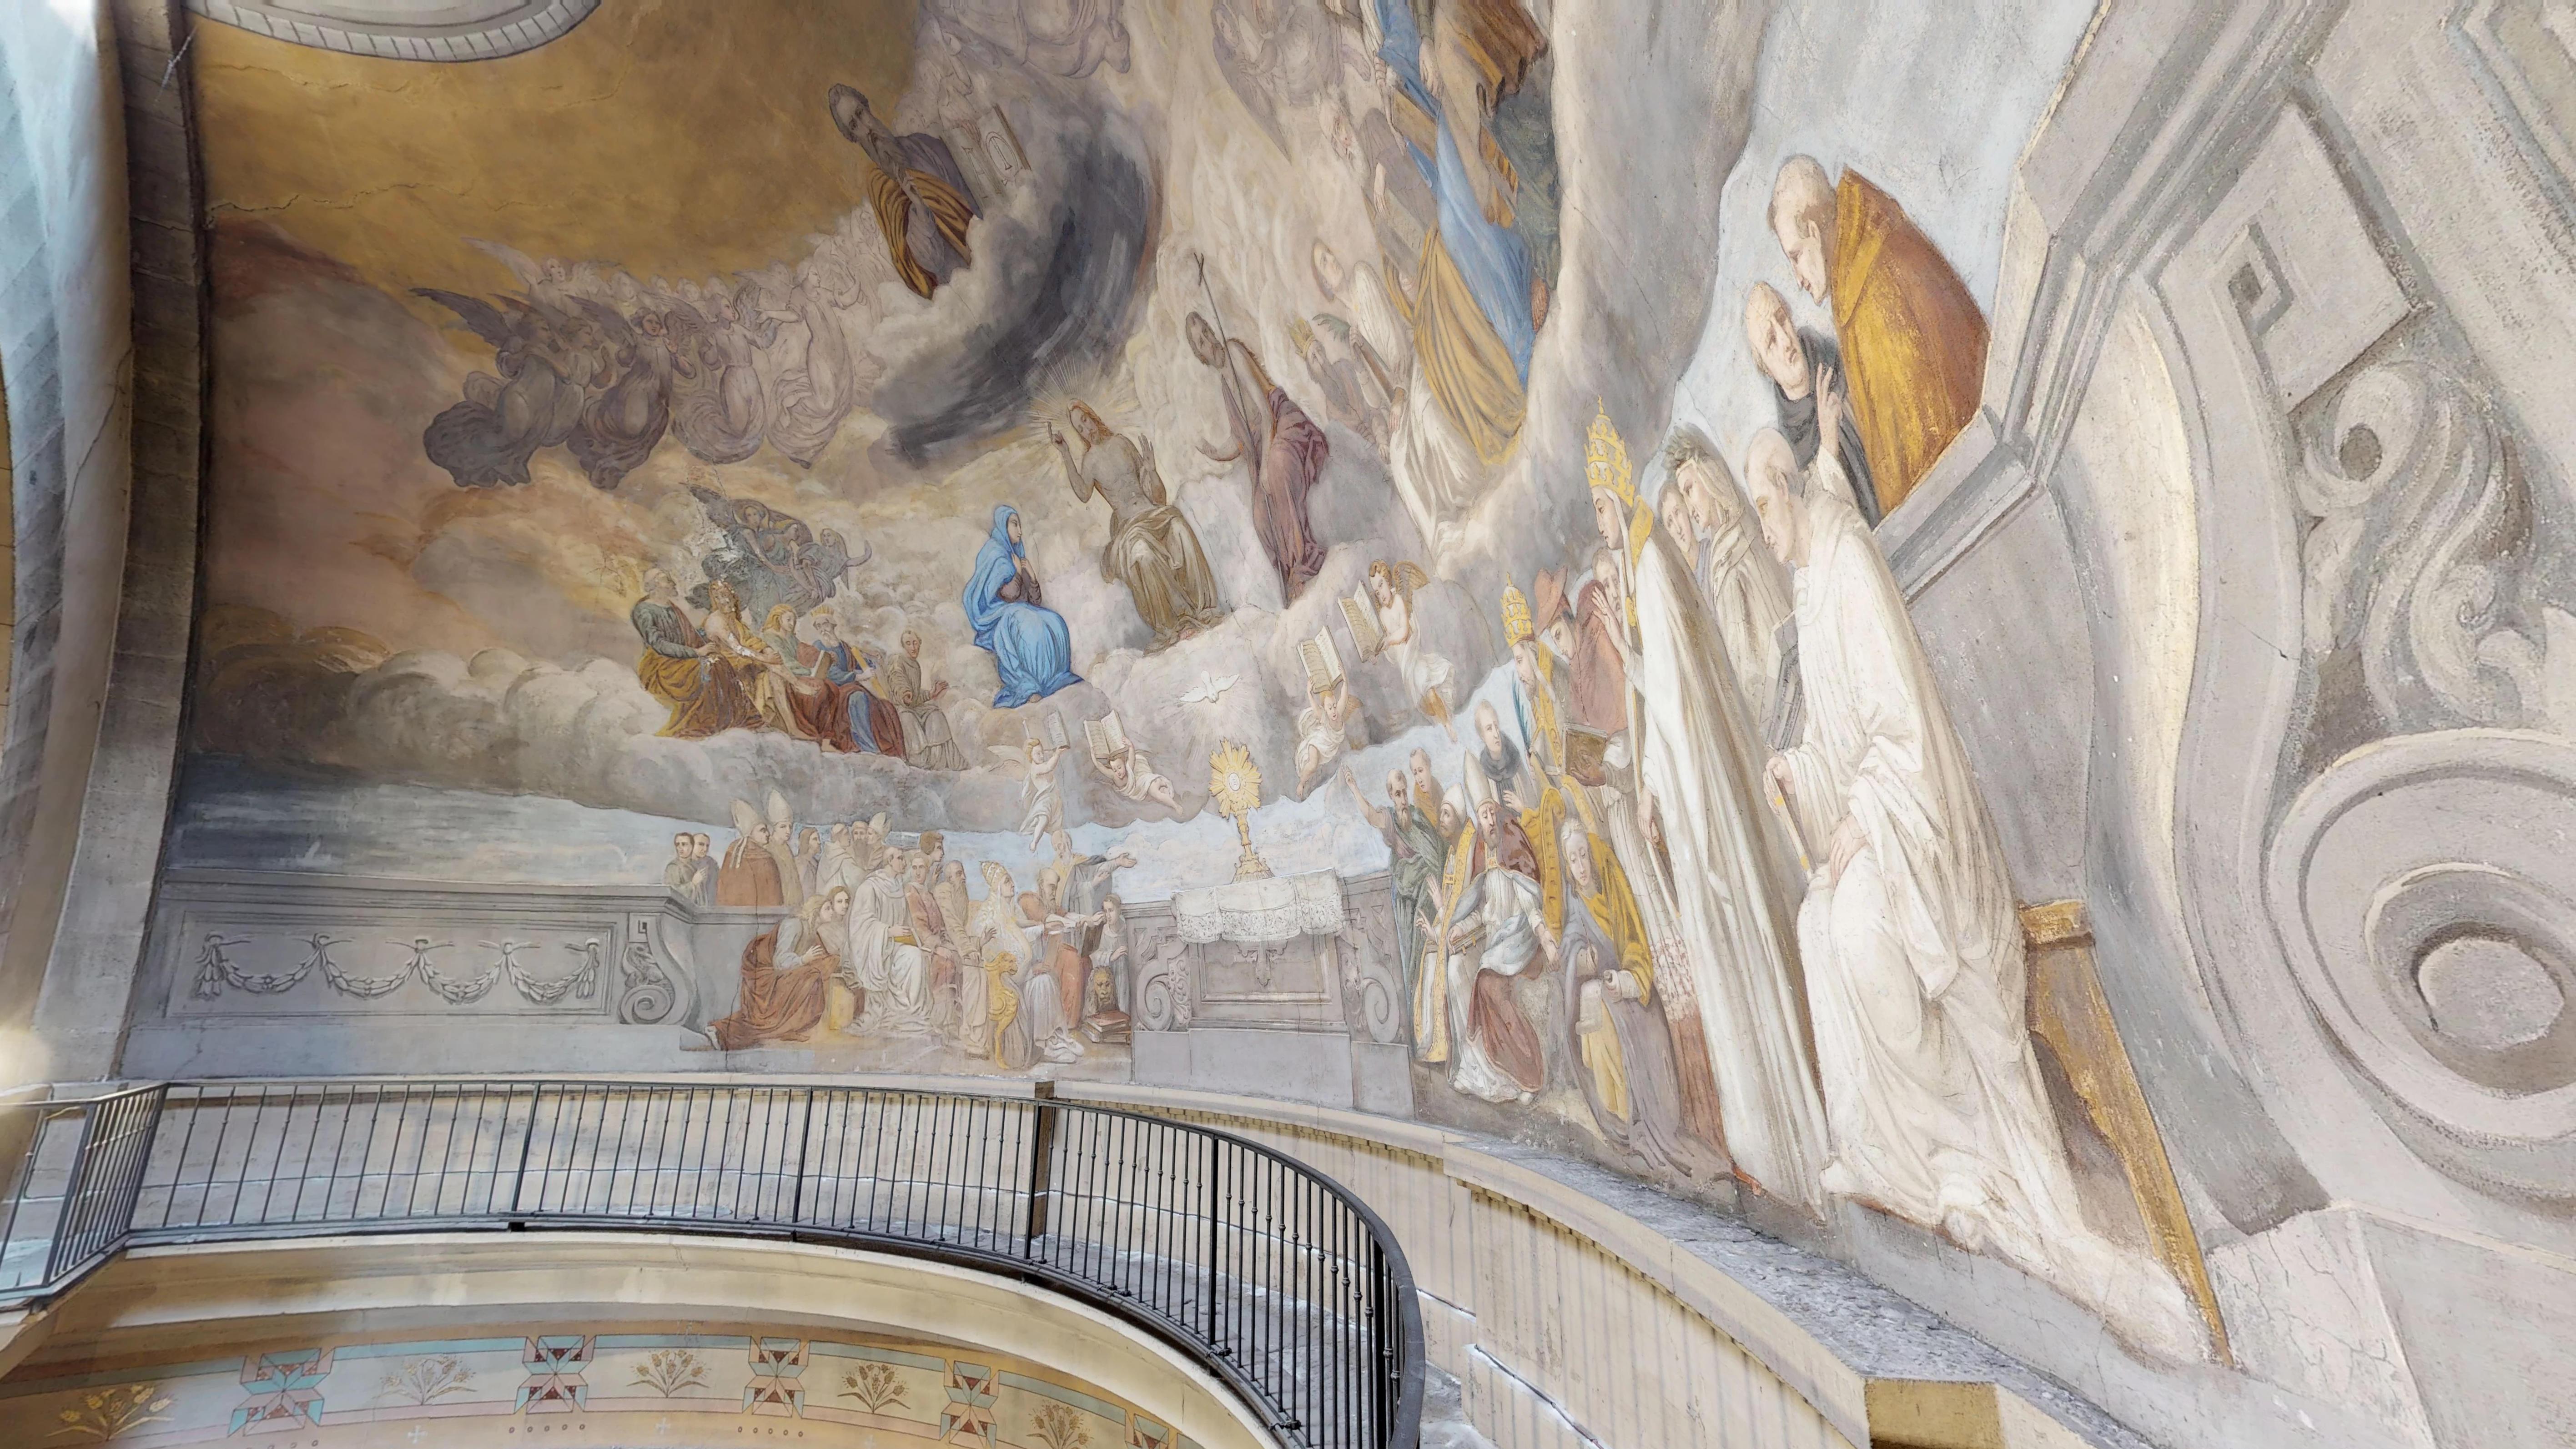 Rive-de-Gier-Eglise-Notre-Dame-2018-Balcon-choeur